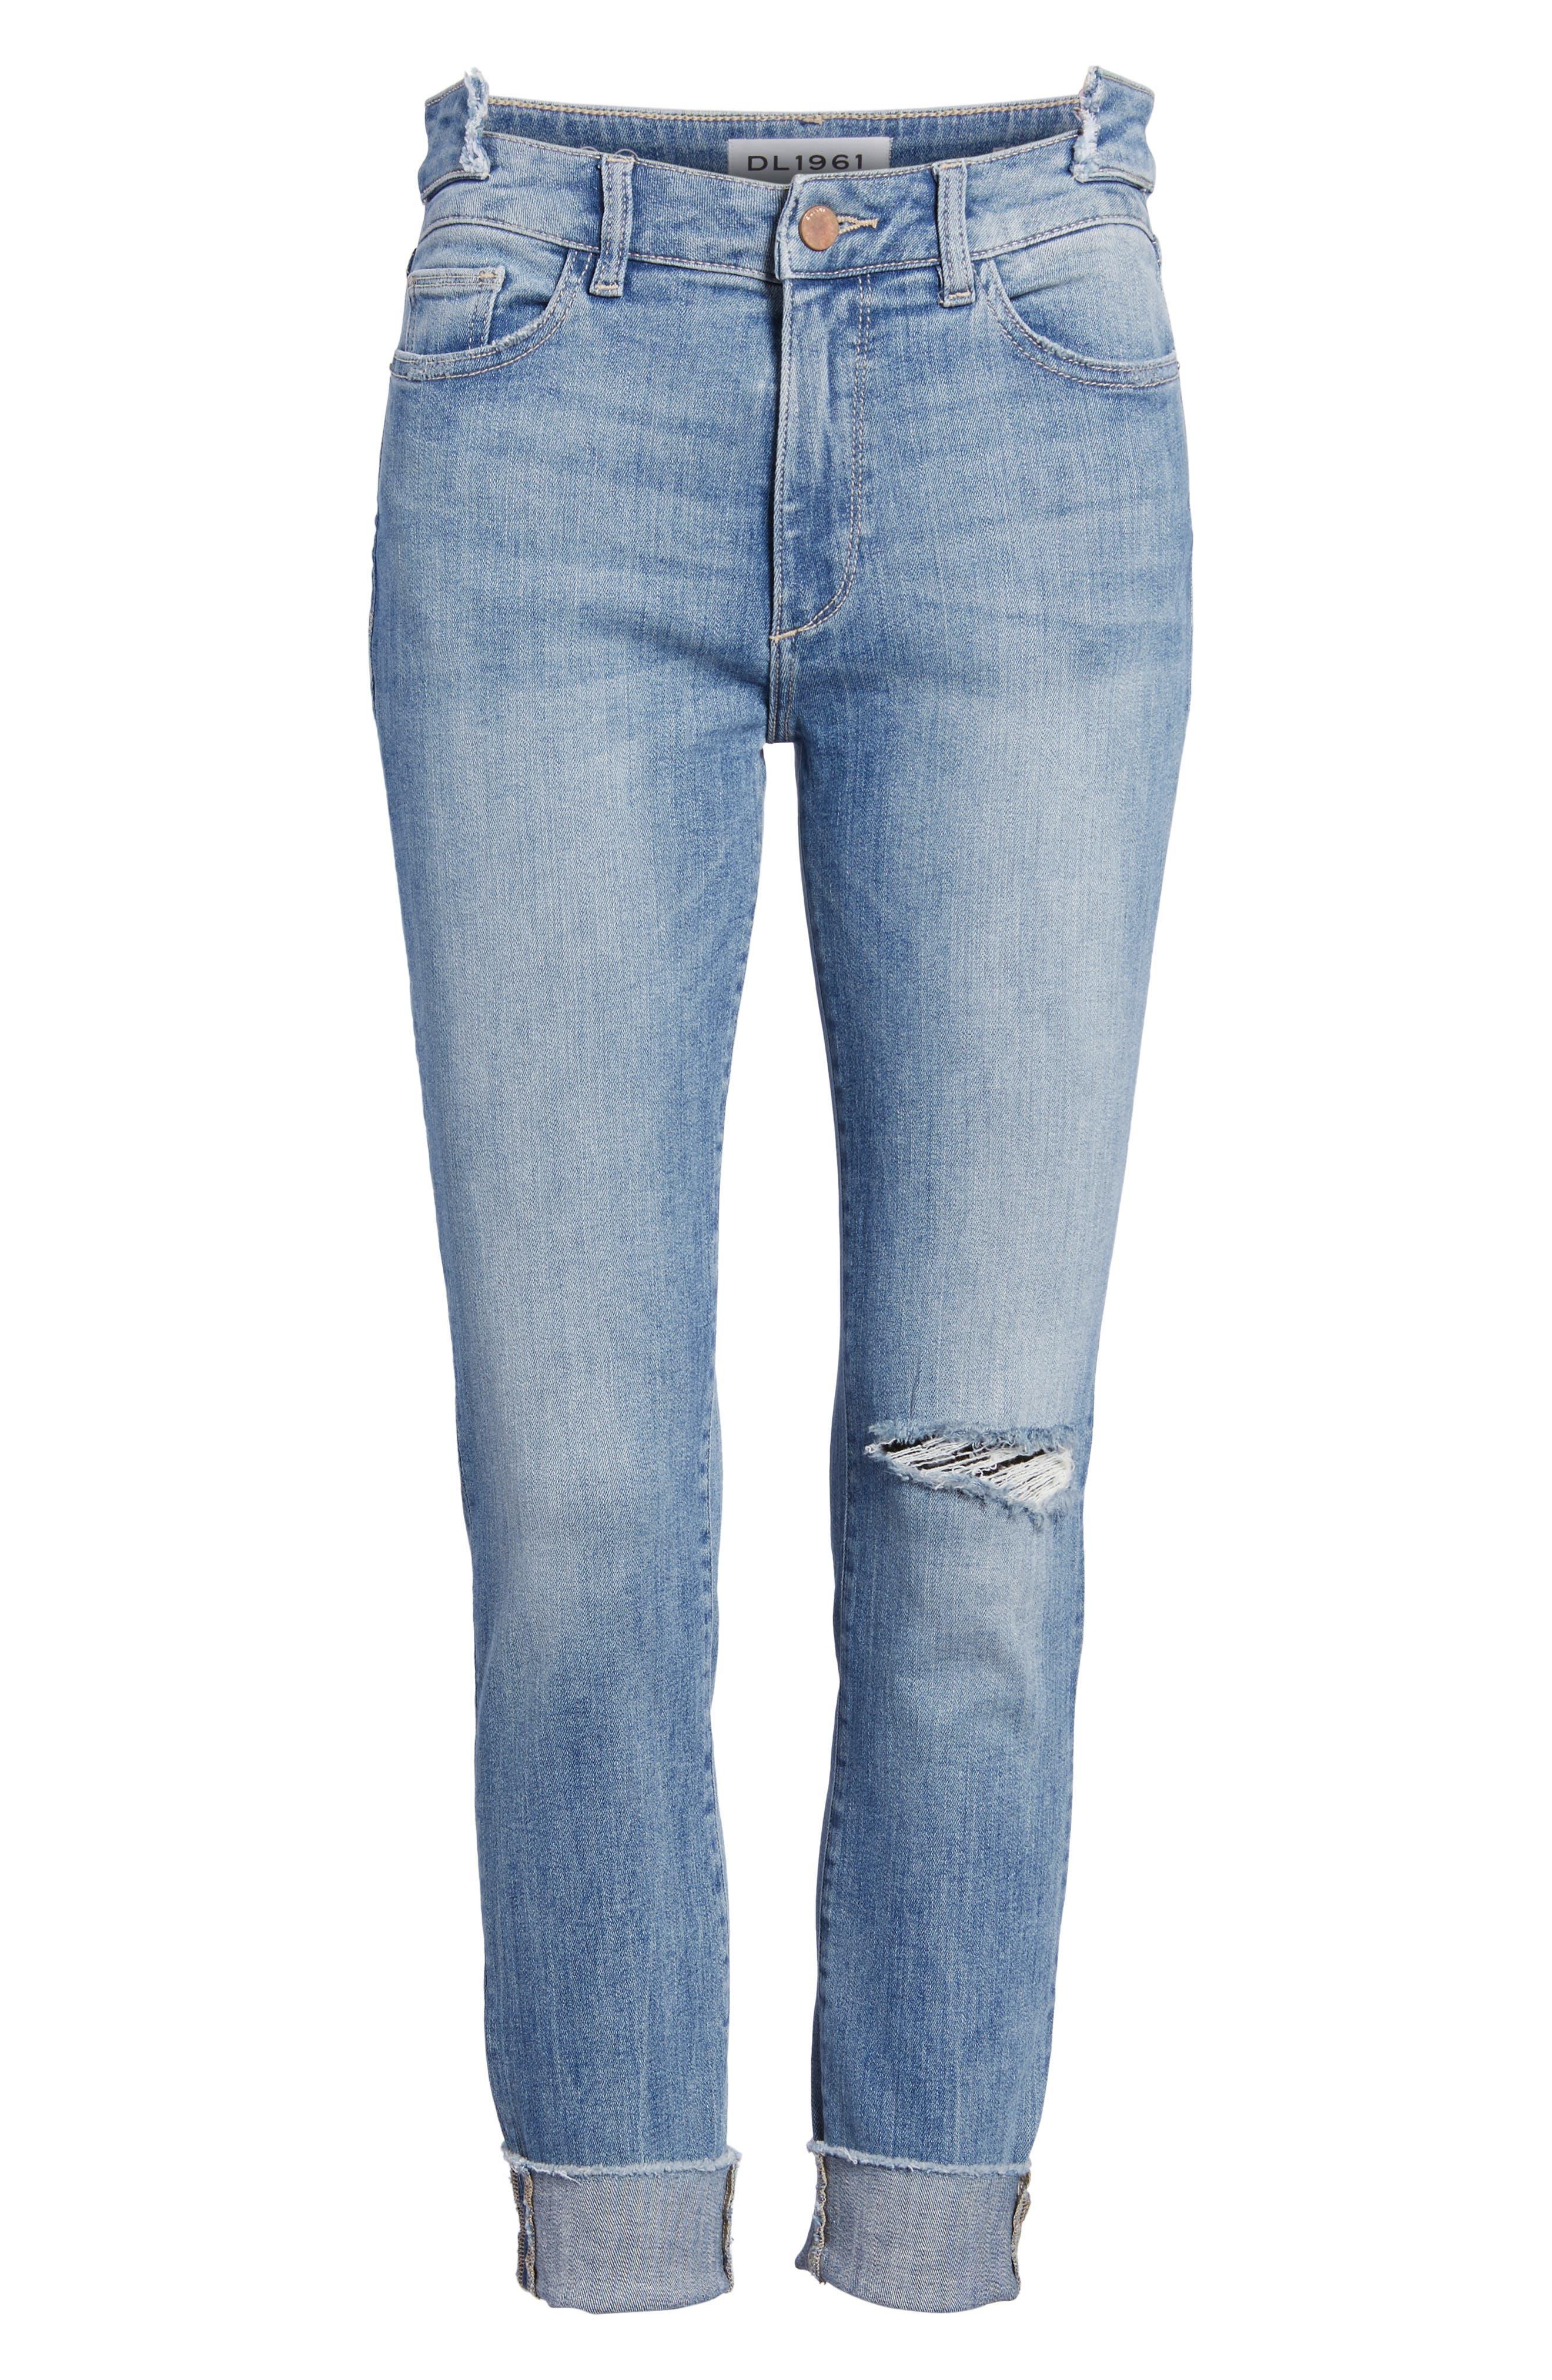 Farrow Instaslim High Waist Ankle Skinny Jeans,                             Alternate thumbnail 7, color,                             429